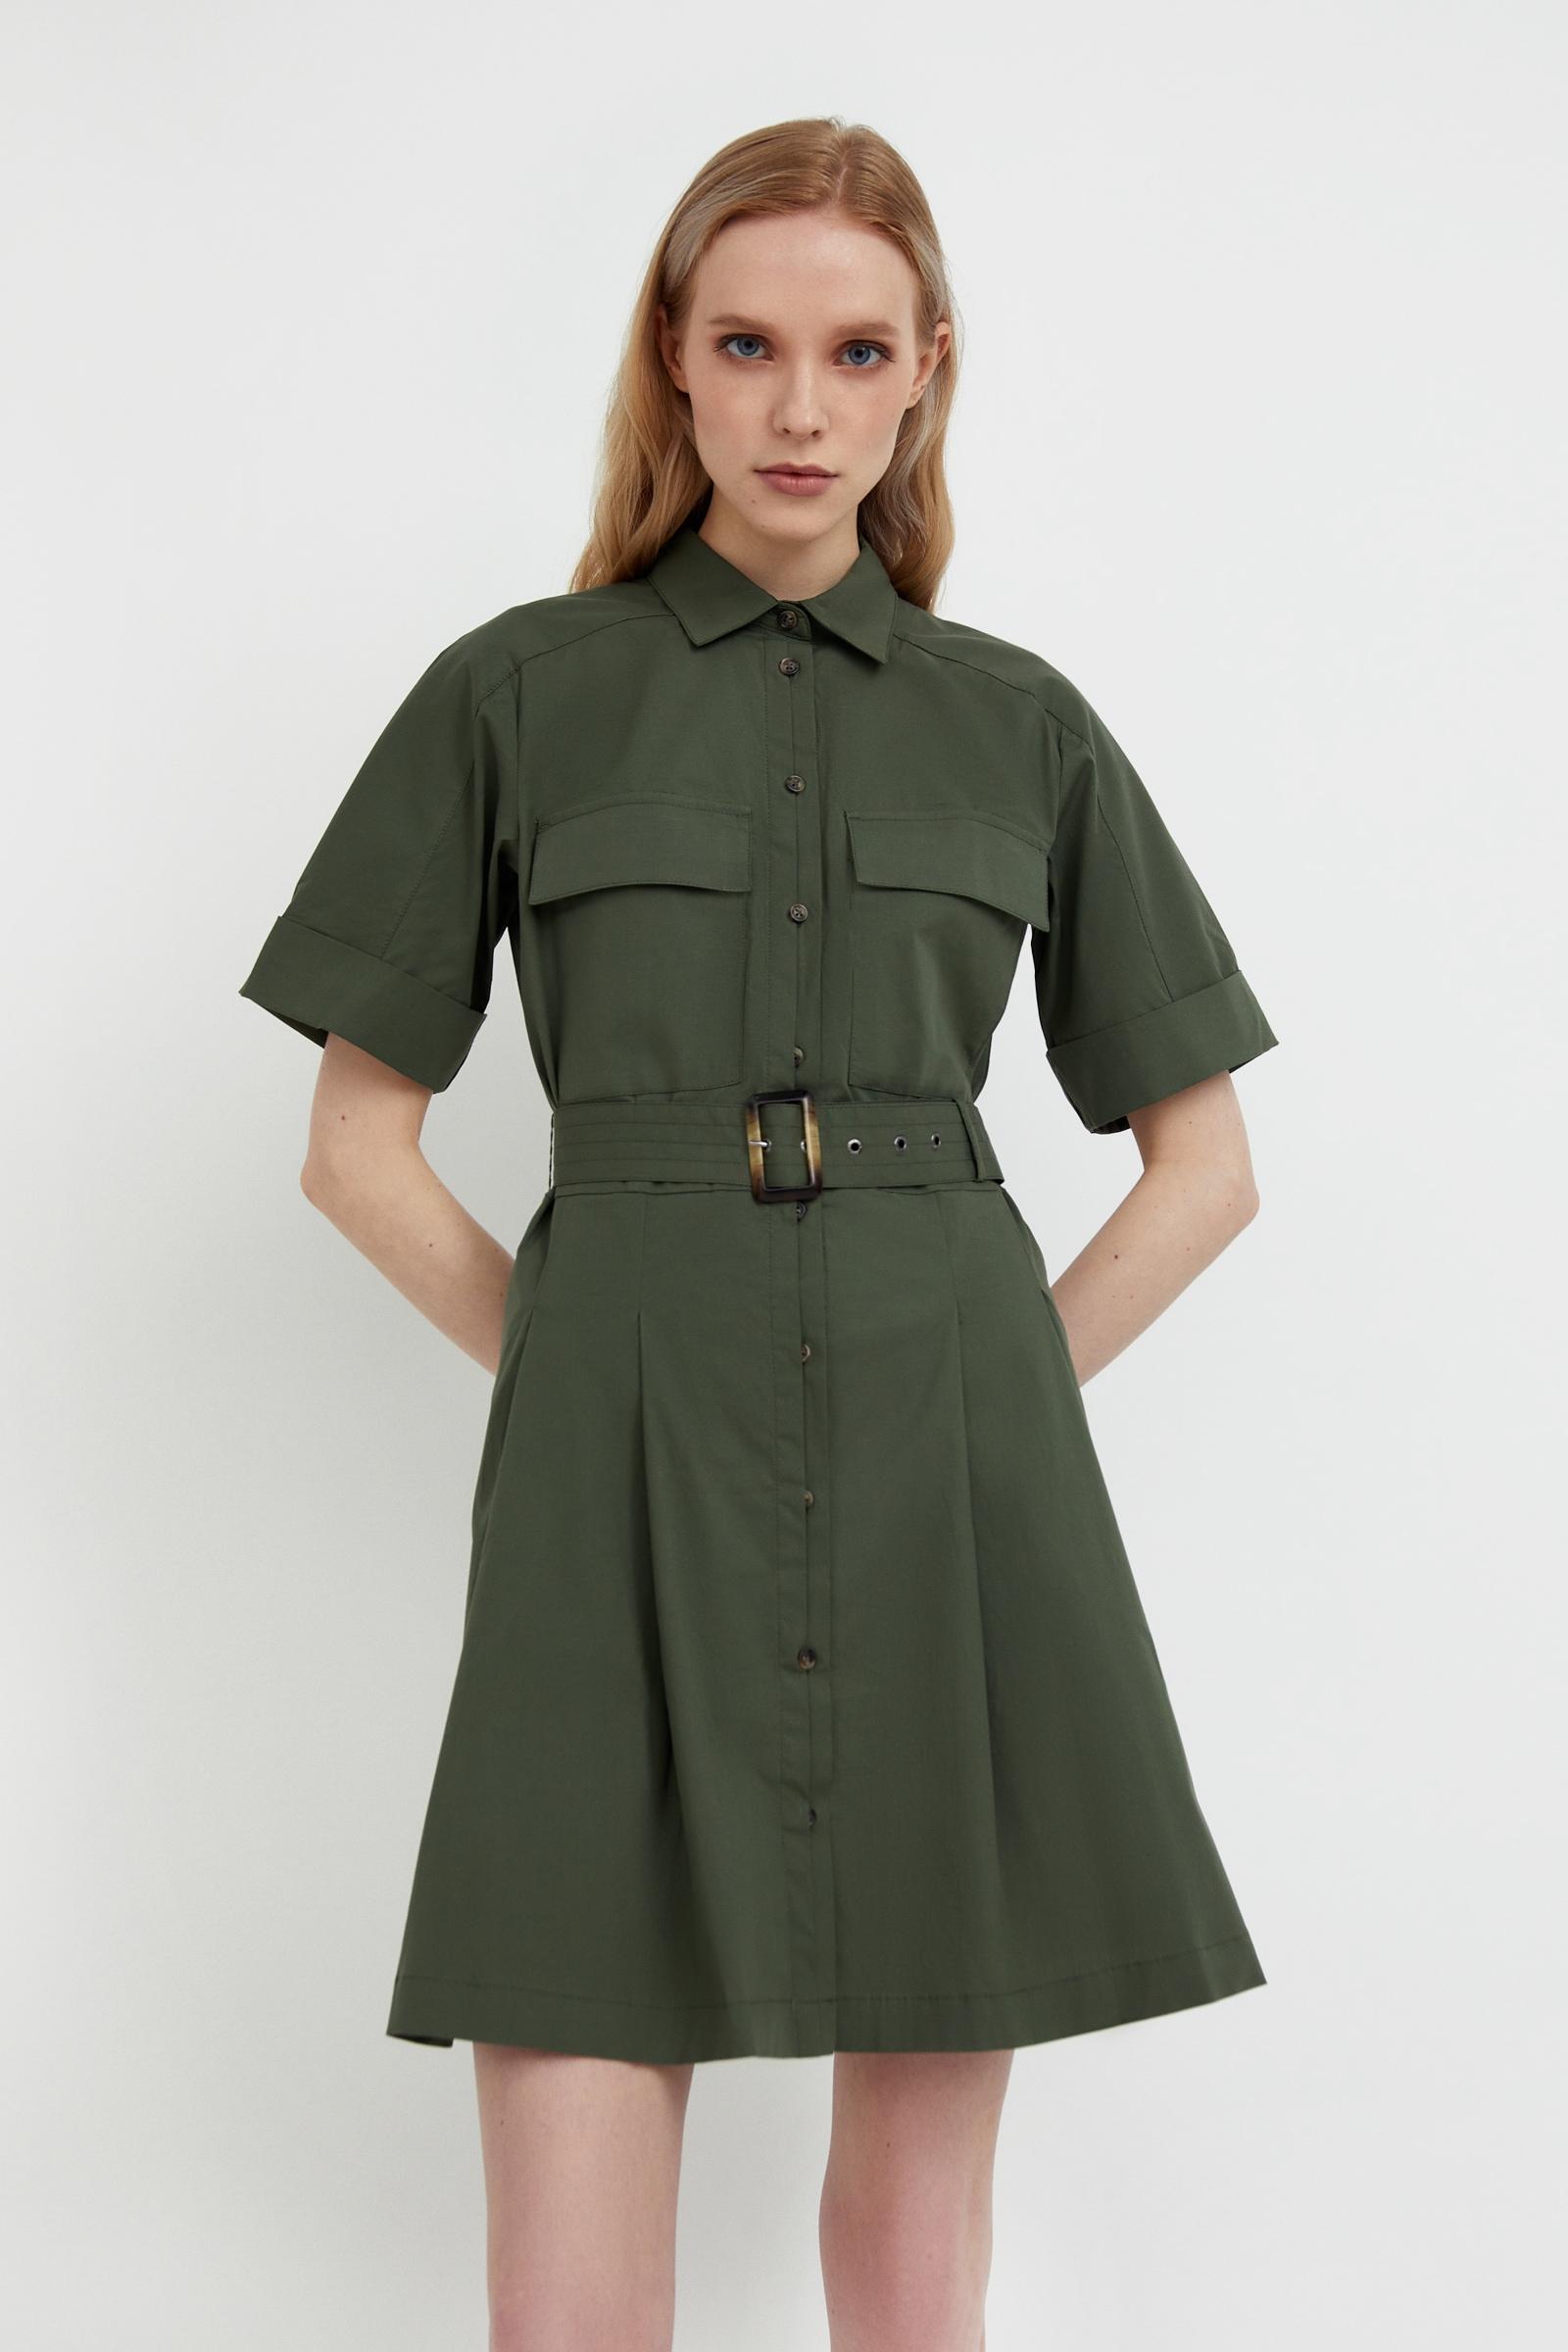 finn flare -  Jerseykleid, in schicker A-Linie